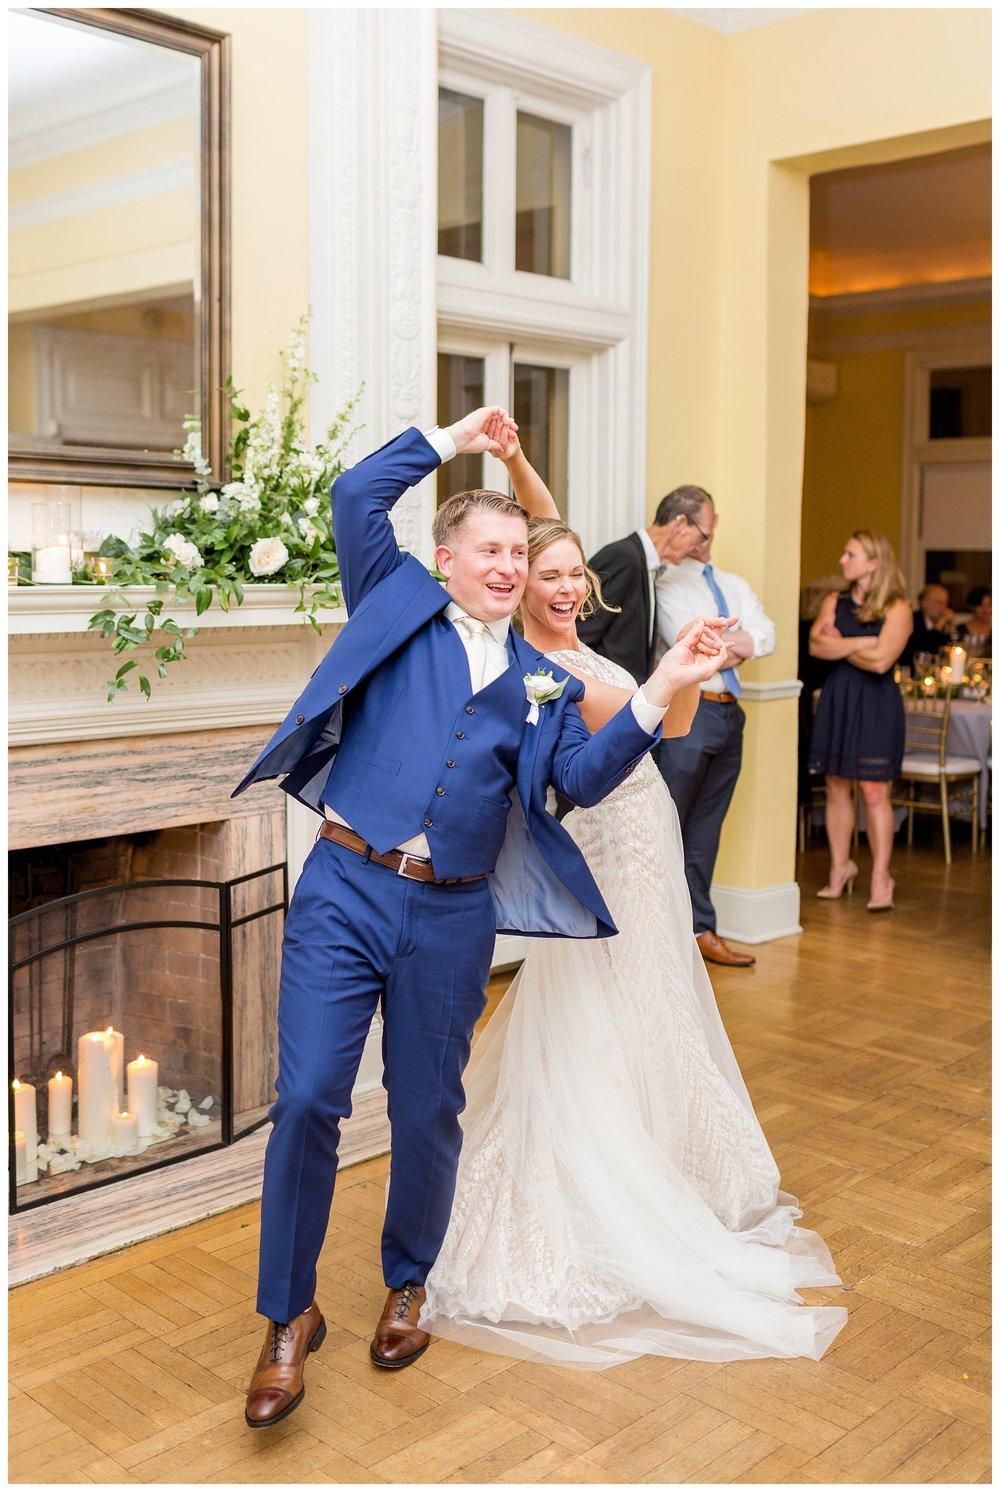 Meridian Hill Park Wedding | Washington DC Wedding Photographer Kir Tuben_0109.jpg